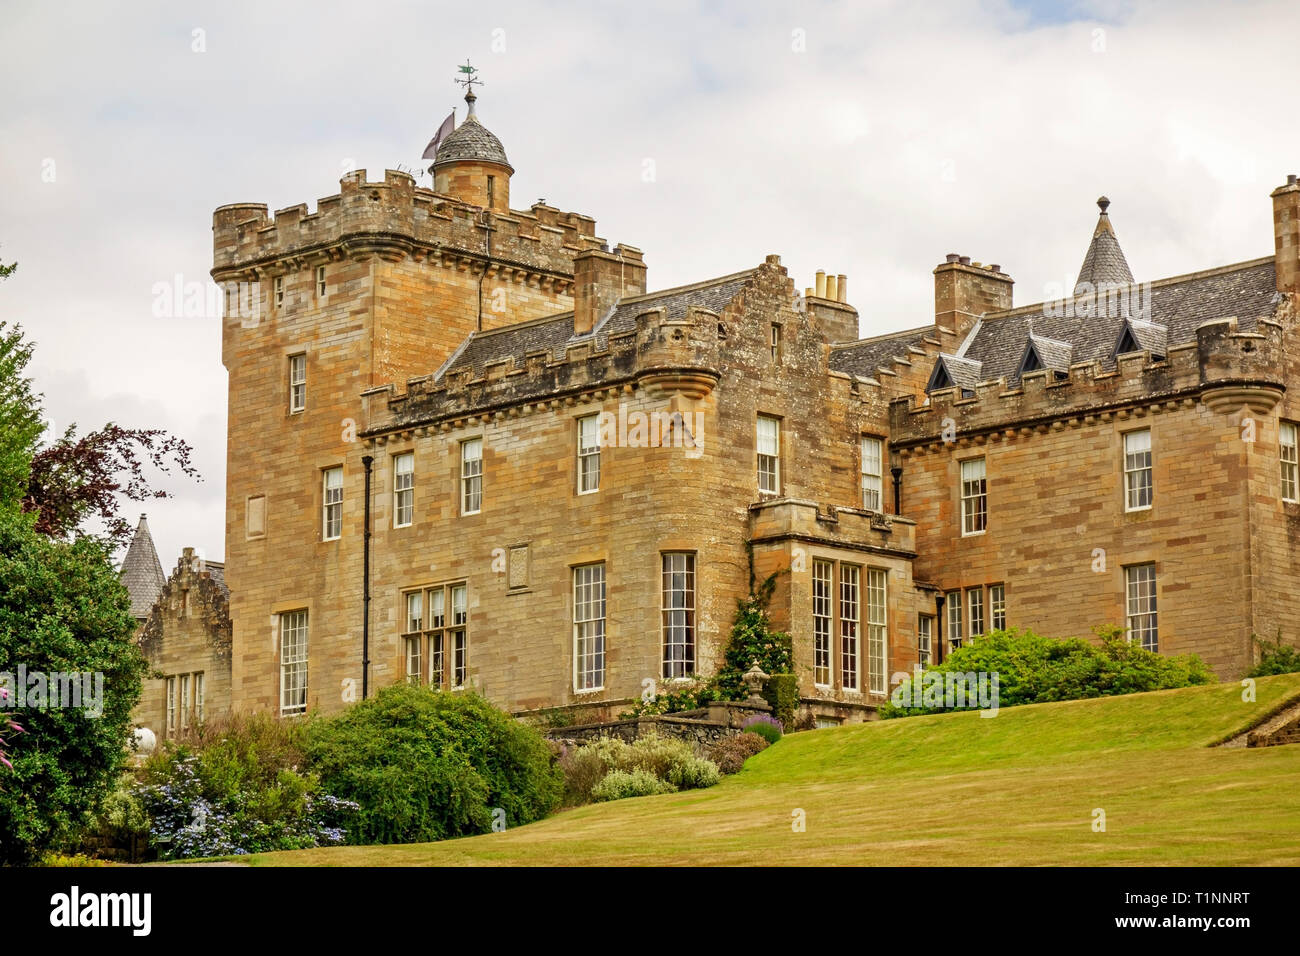 Luxury 5 star Glenapp Castle hotel near Ballantrae, South Ayrshire, Scotland,UK. Stock Photo